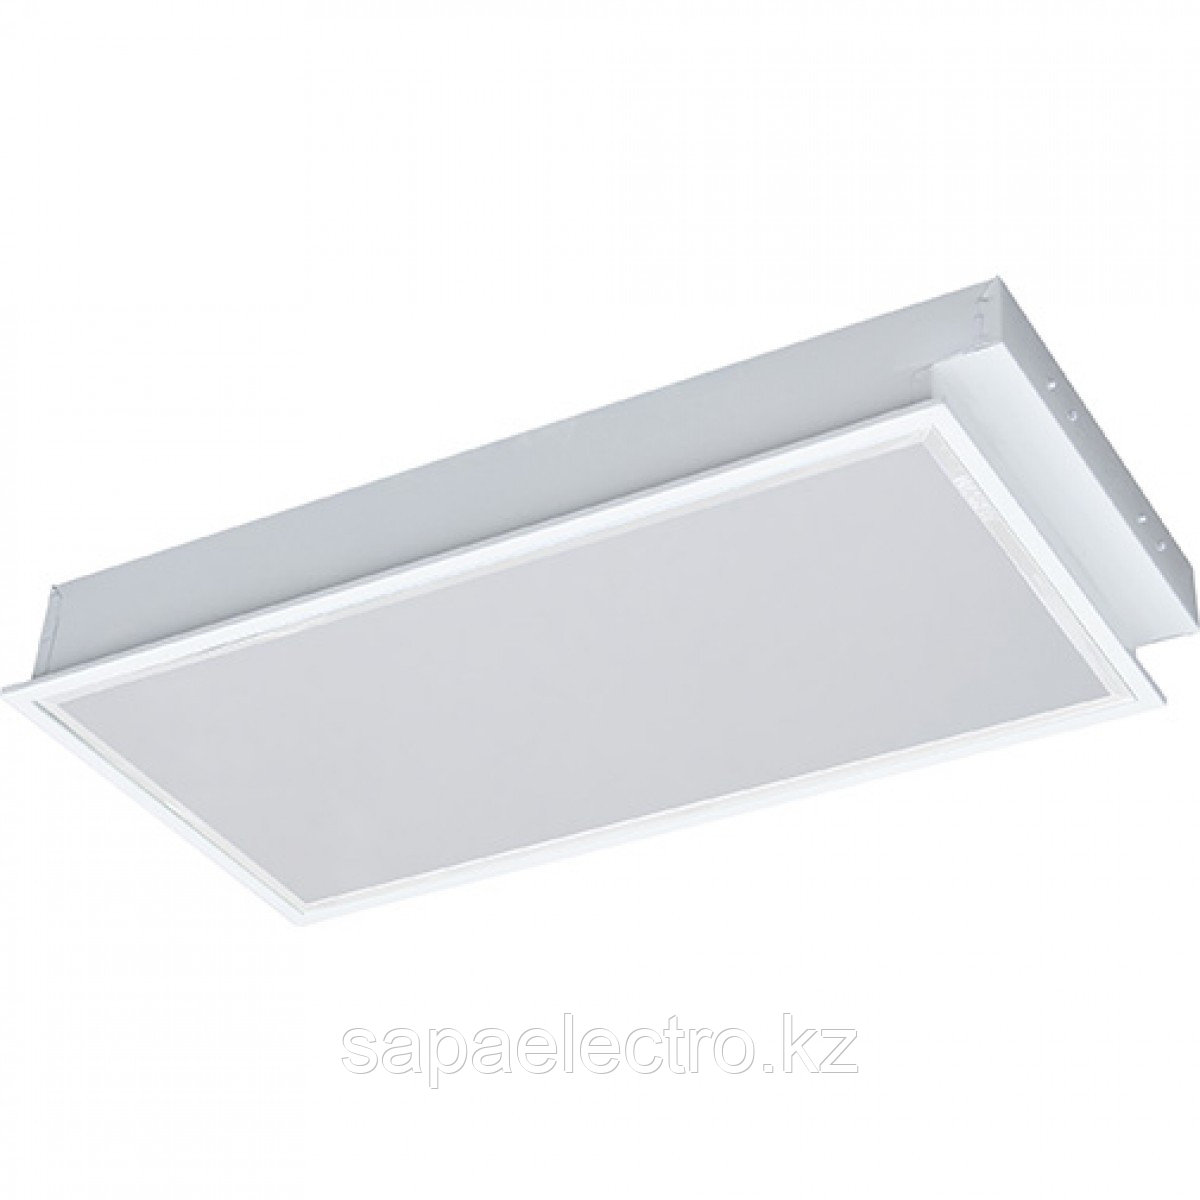 Cв-к LEDTUBE LZV 2x9W/ 60см OPAL встр-й (с лампой)M